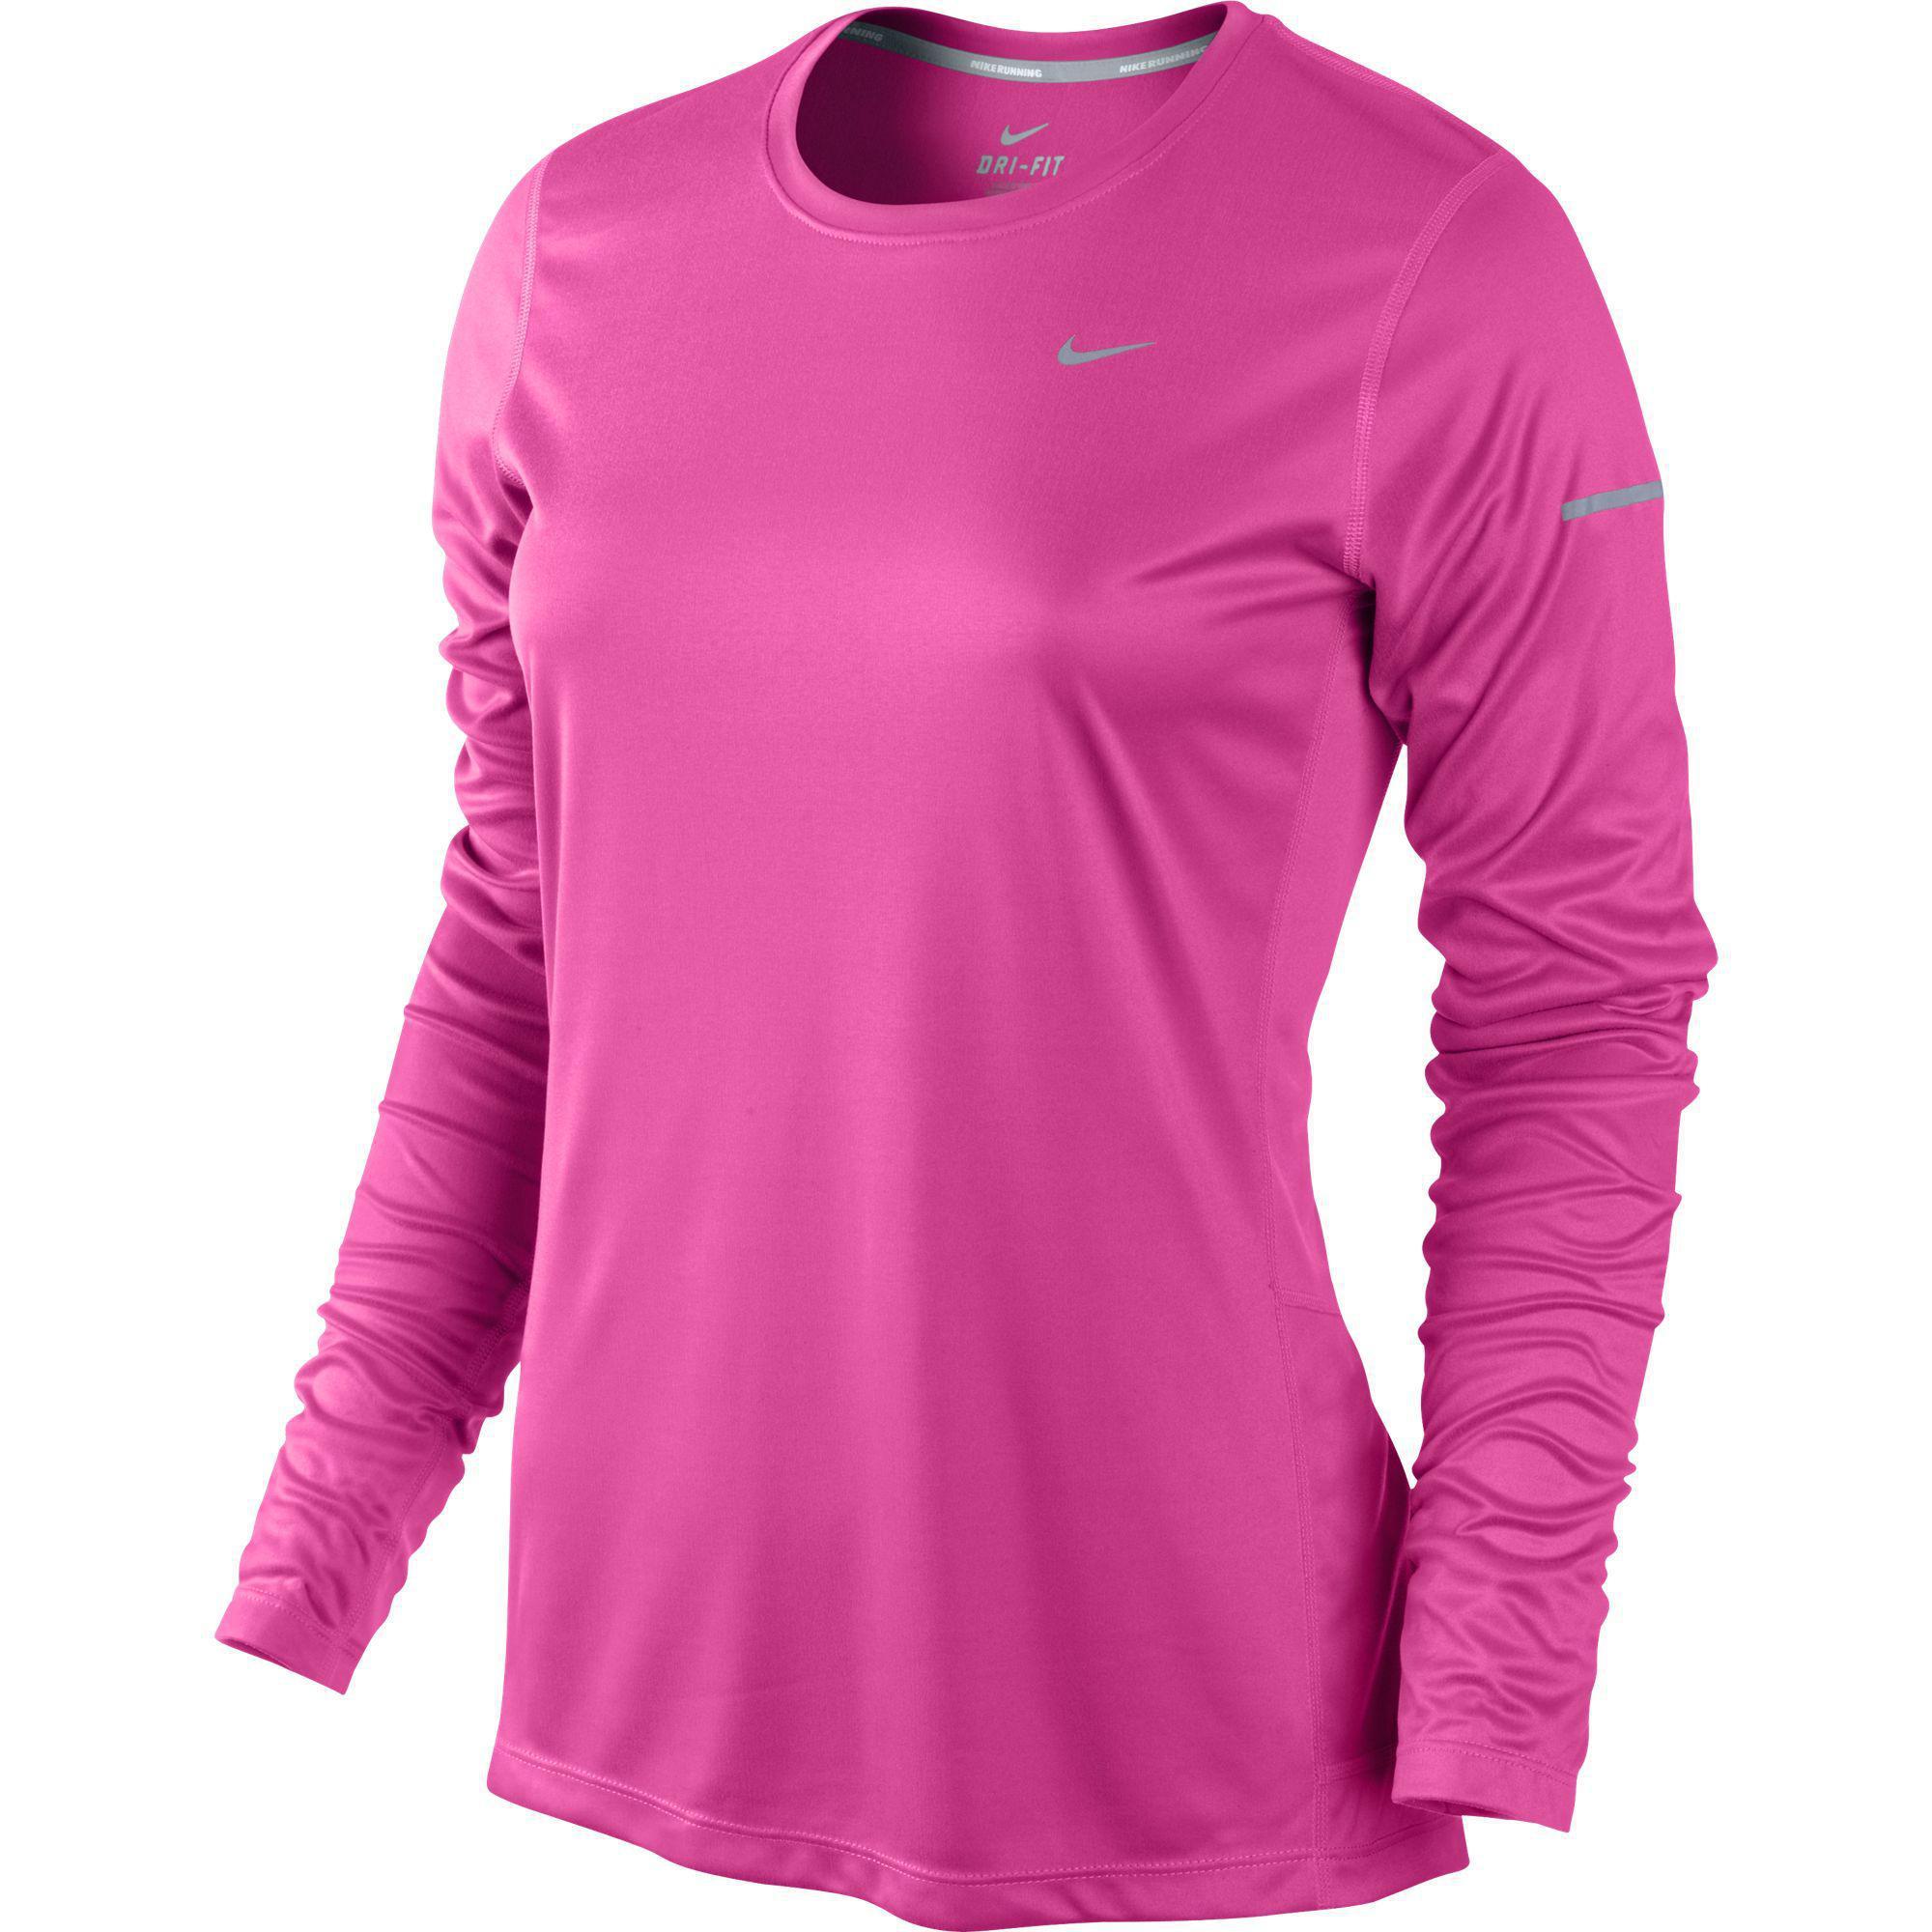 Nike Womens Miler Long Sleeve Running Top - Pink Pow Silver - Tennisnuts.com ff7fe37e975